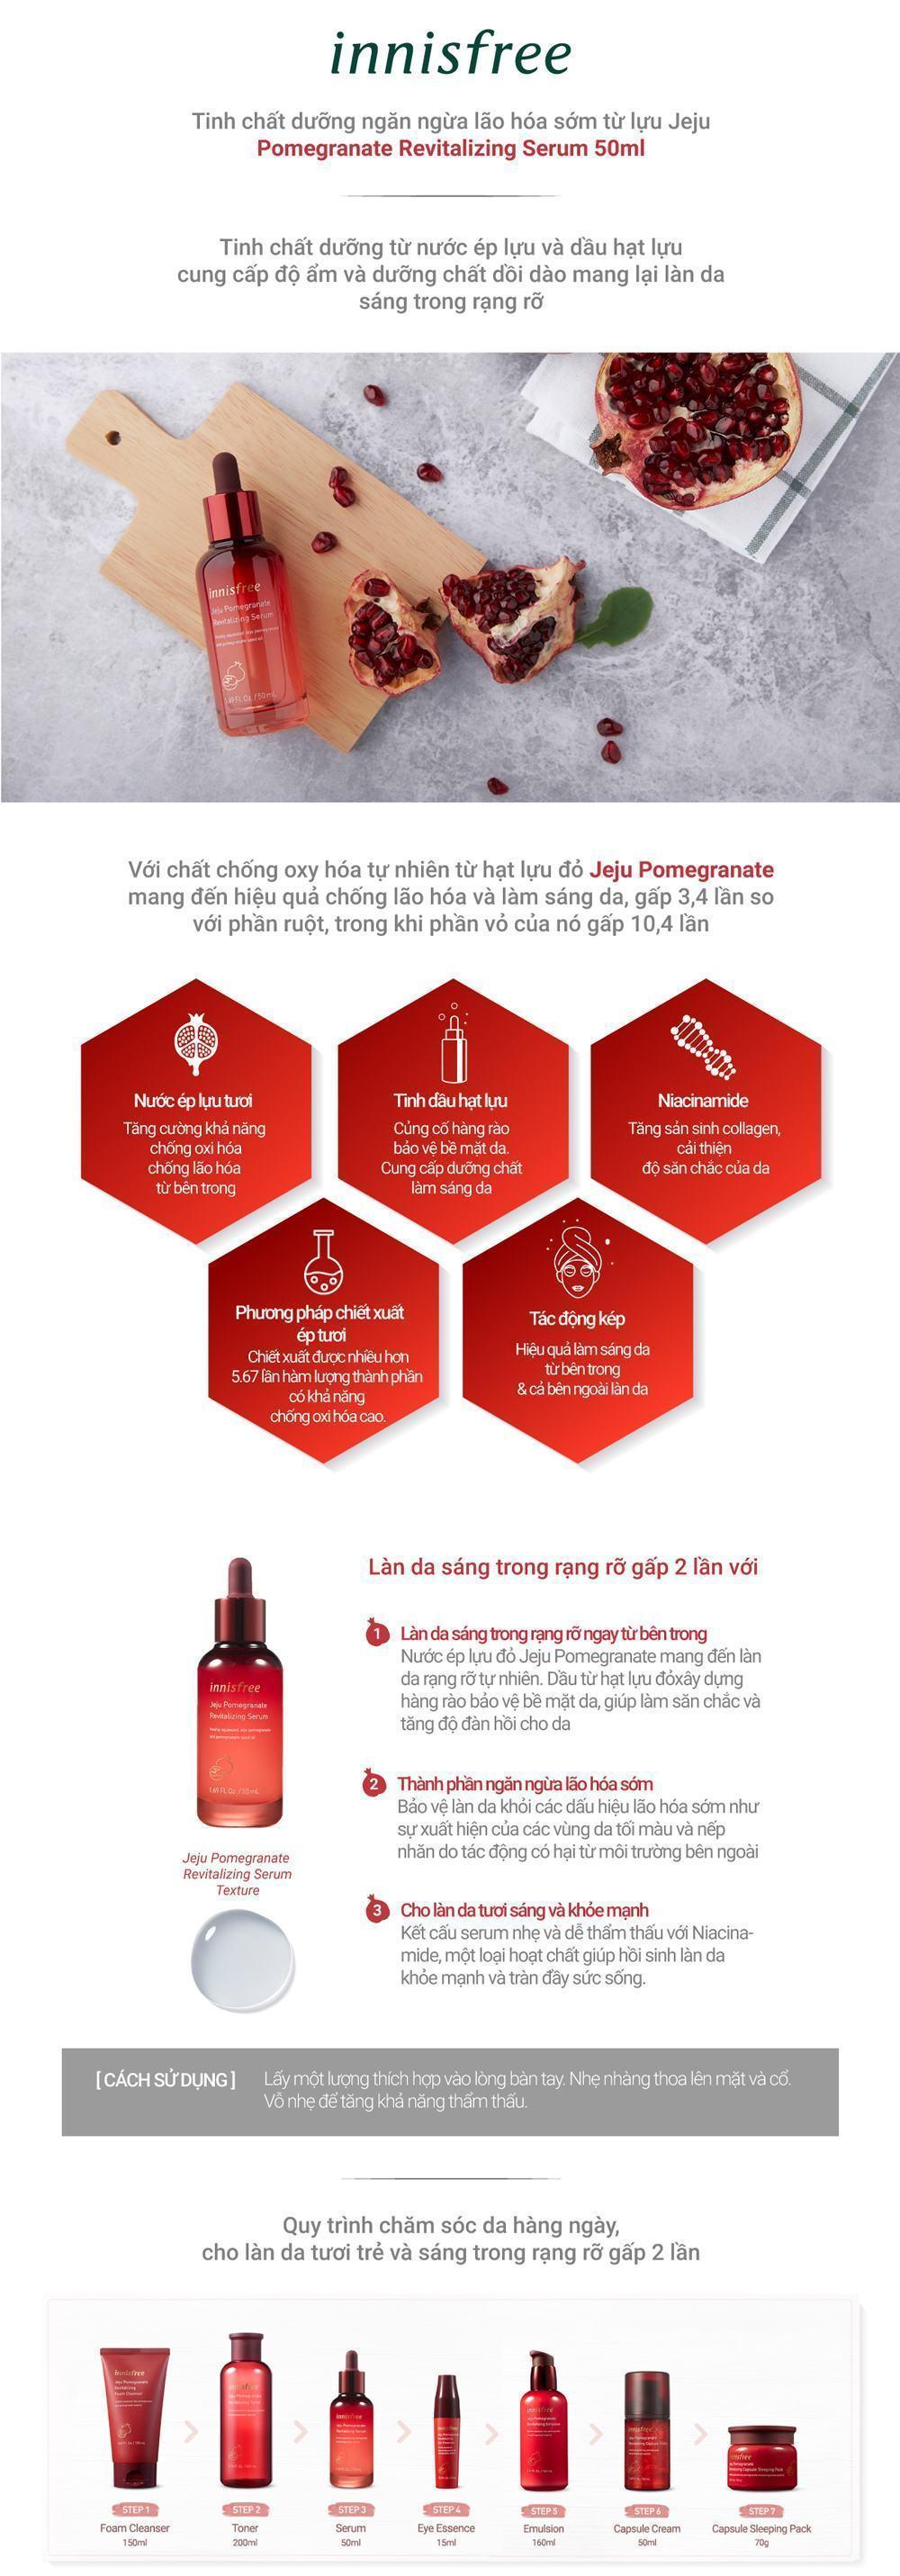 Tinh Chất Ngăn Ngừa Lão Hóa Từ Lựu Innisfree Jeju Pomegranate Revitalizing Serum (50ml)